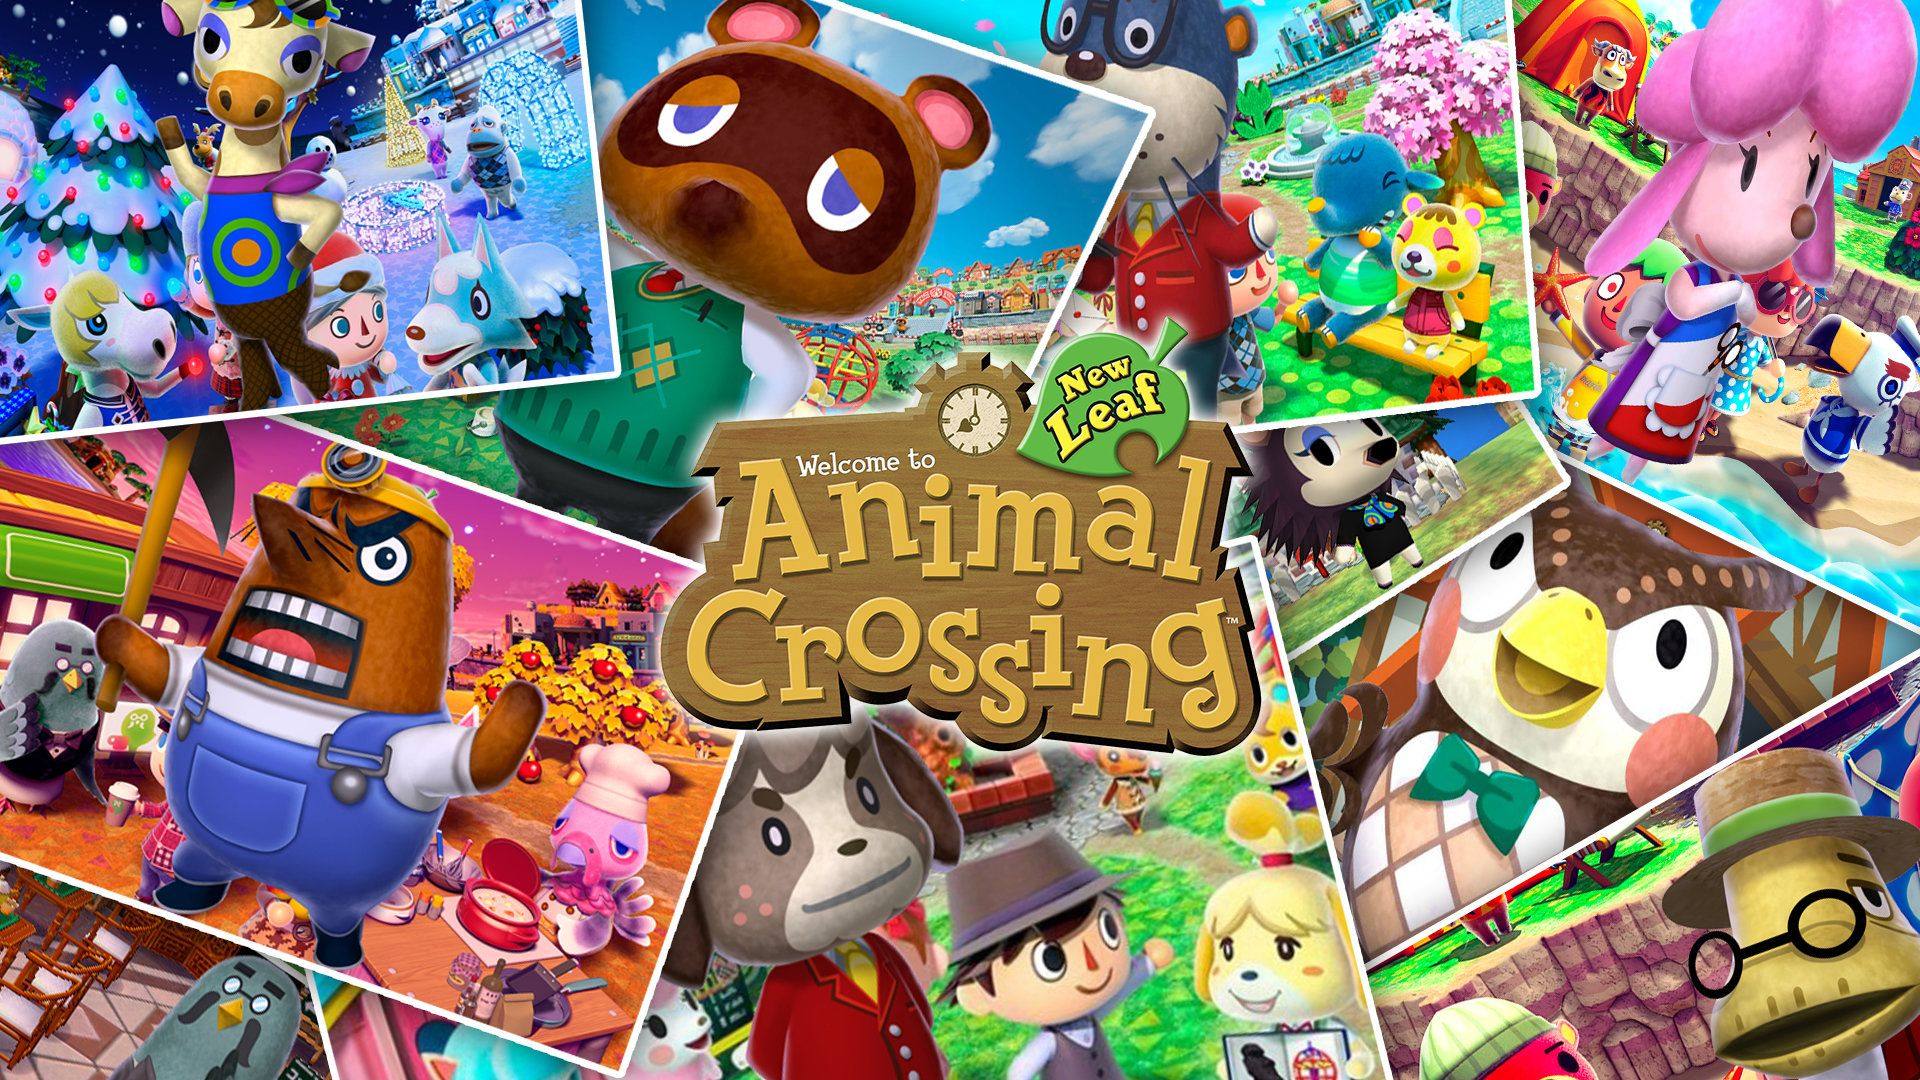 aesthetic animal crossing new horizons desktop wallpaper